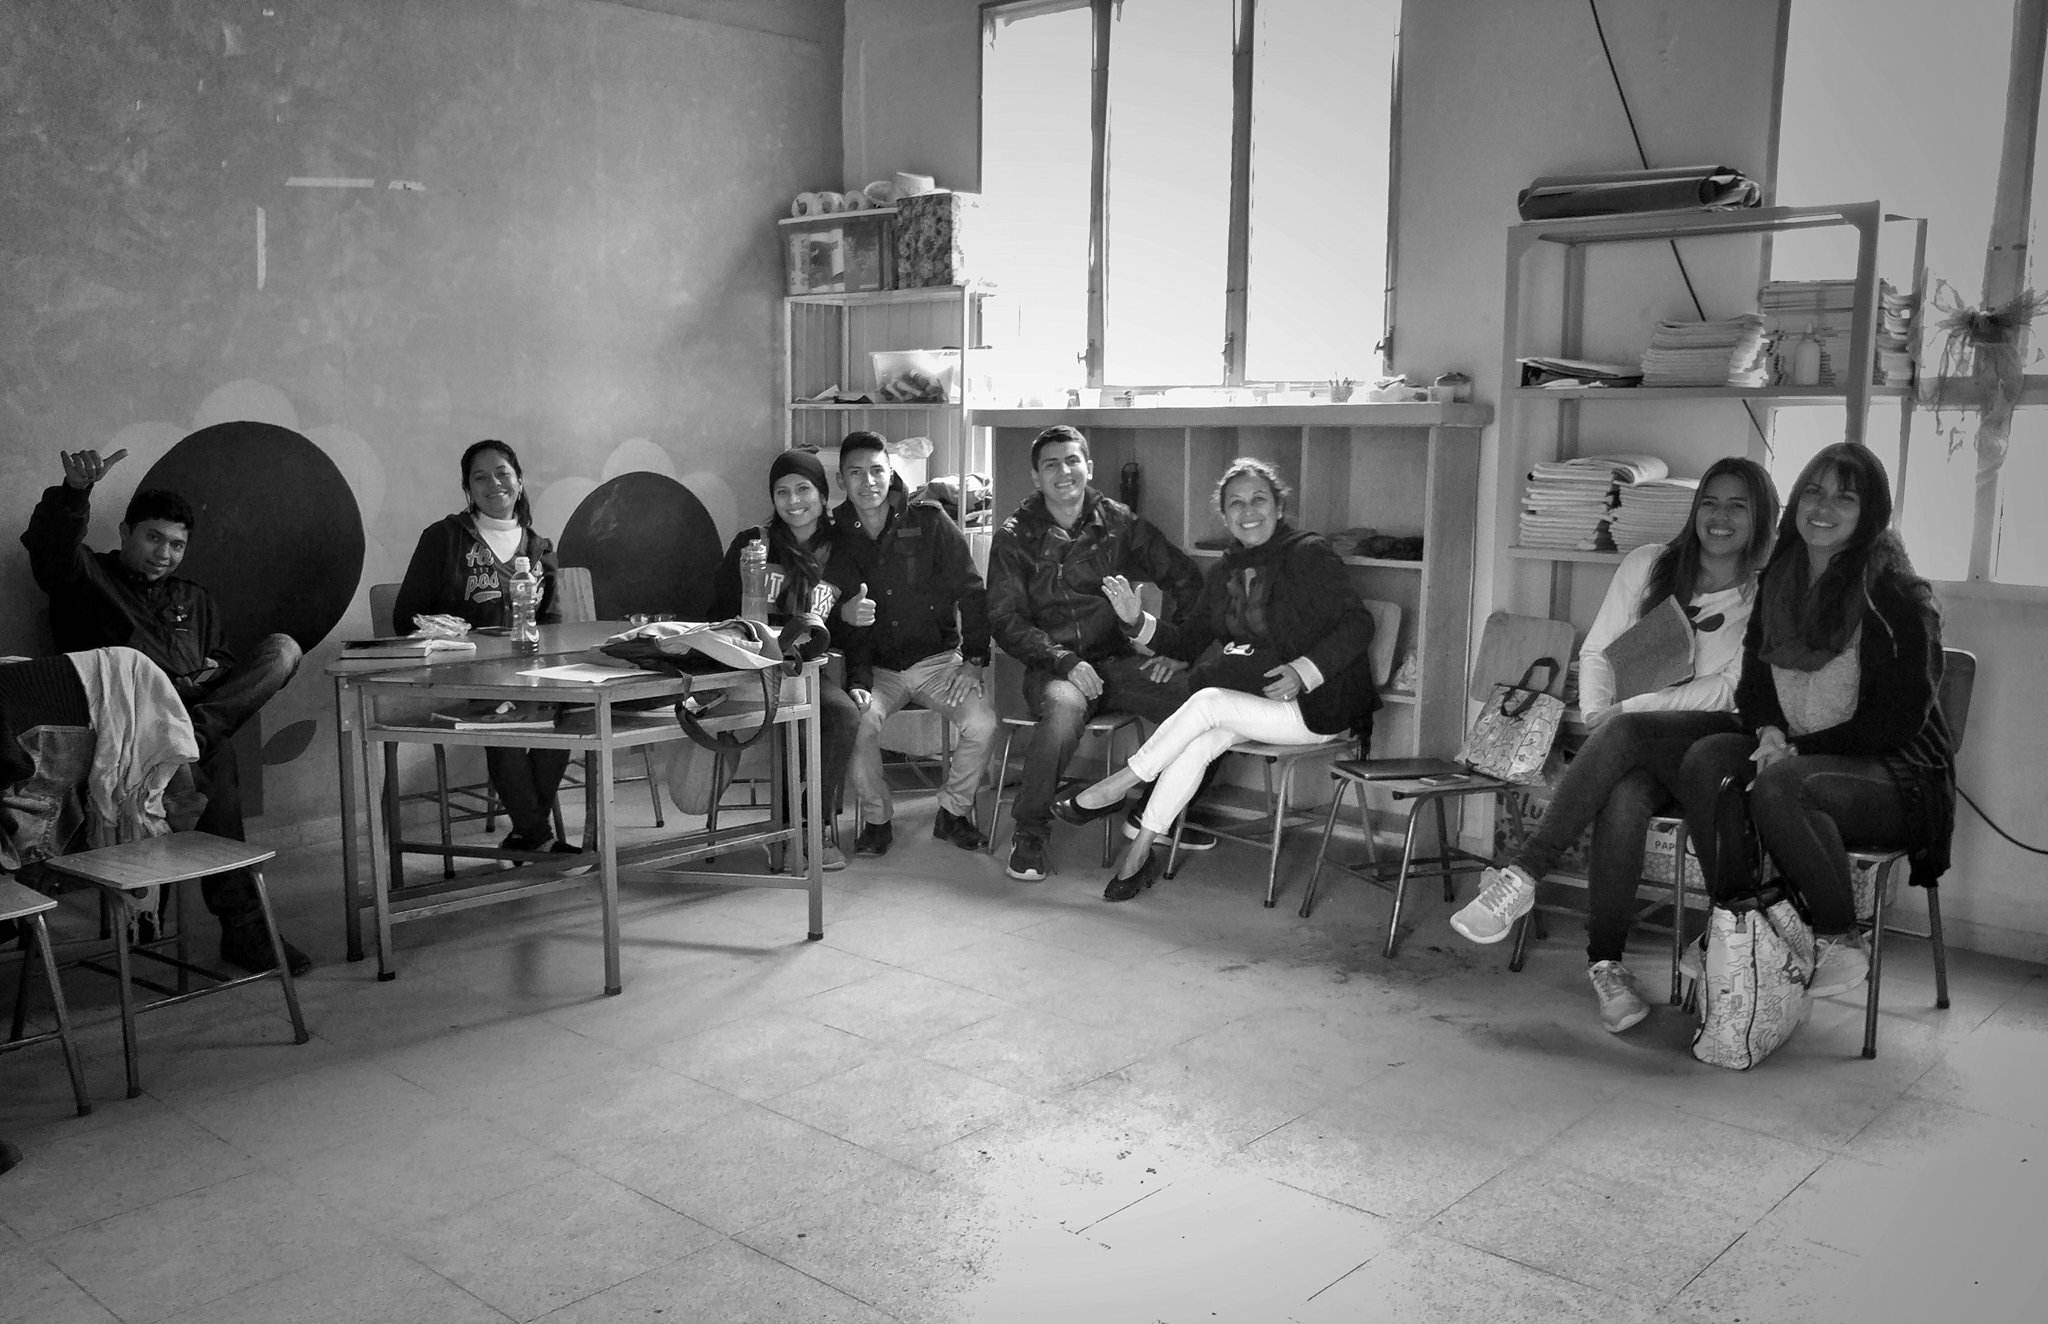 ReThinkFestival-Marcala-2018-preparations-ReFashionReFood-COMSA-International-School (3).jpg